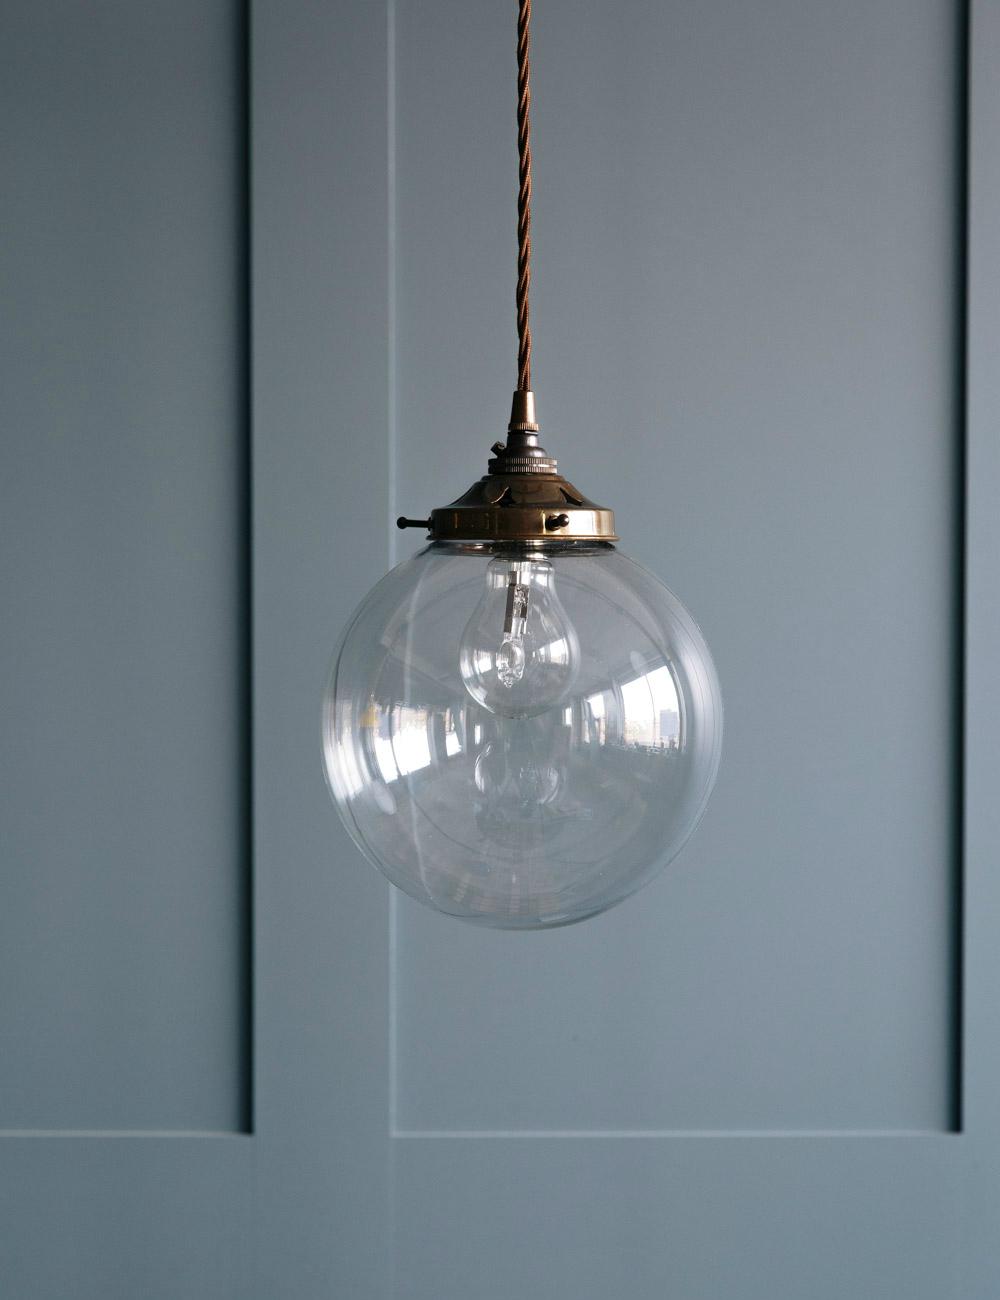 globe blown glass pendant light at rose grey. Black Bedroom Furniture Sets. Home Design Ideas